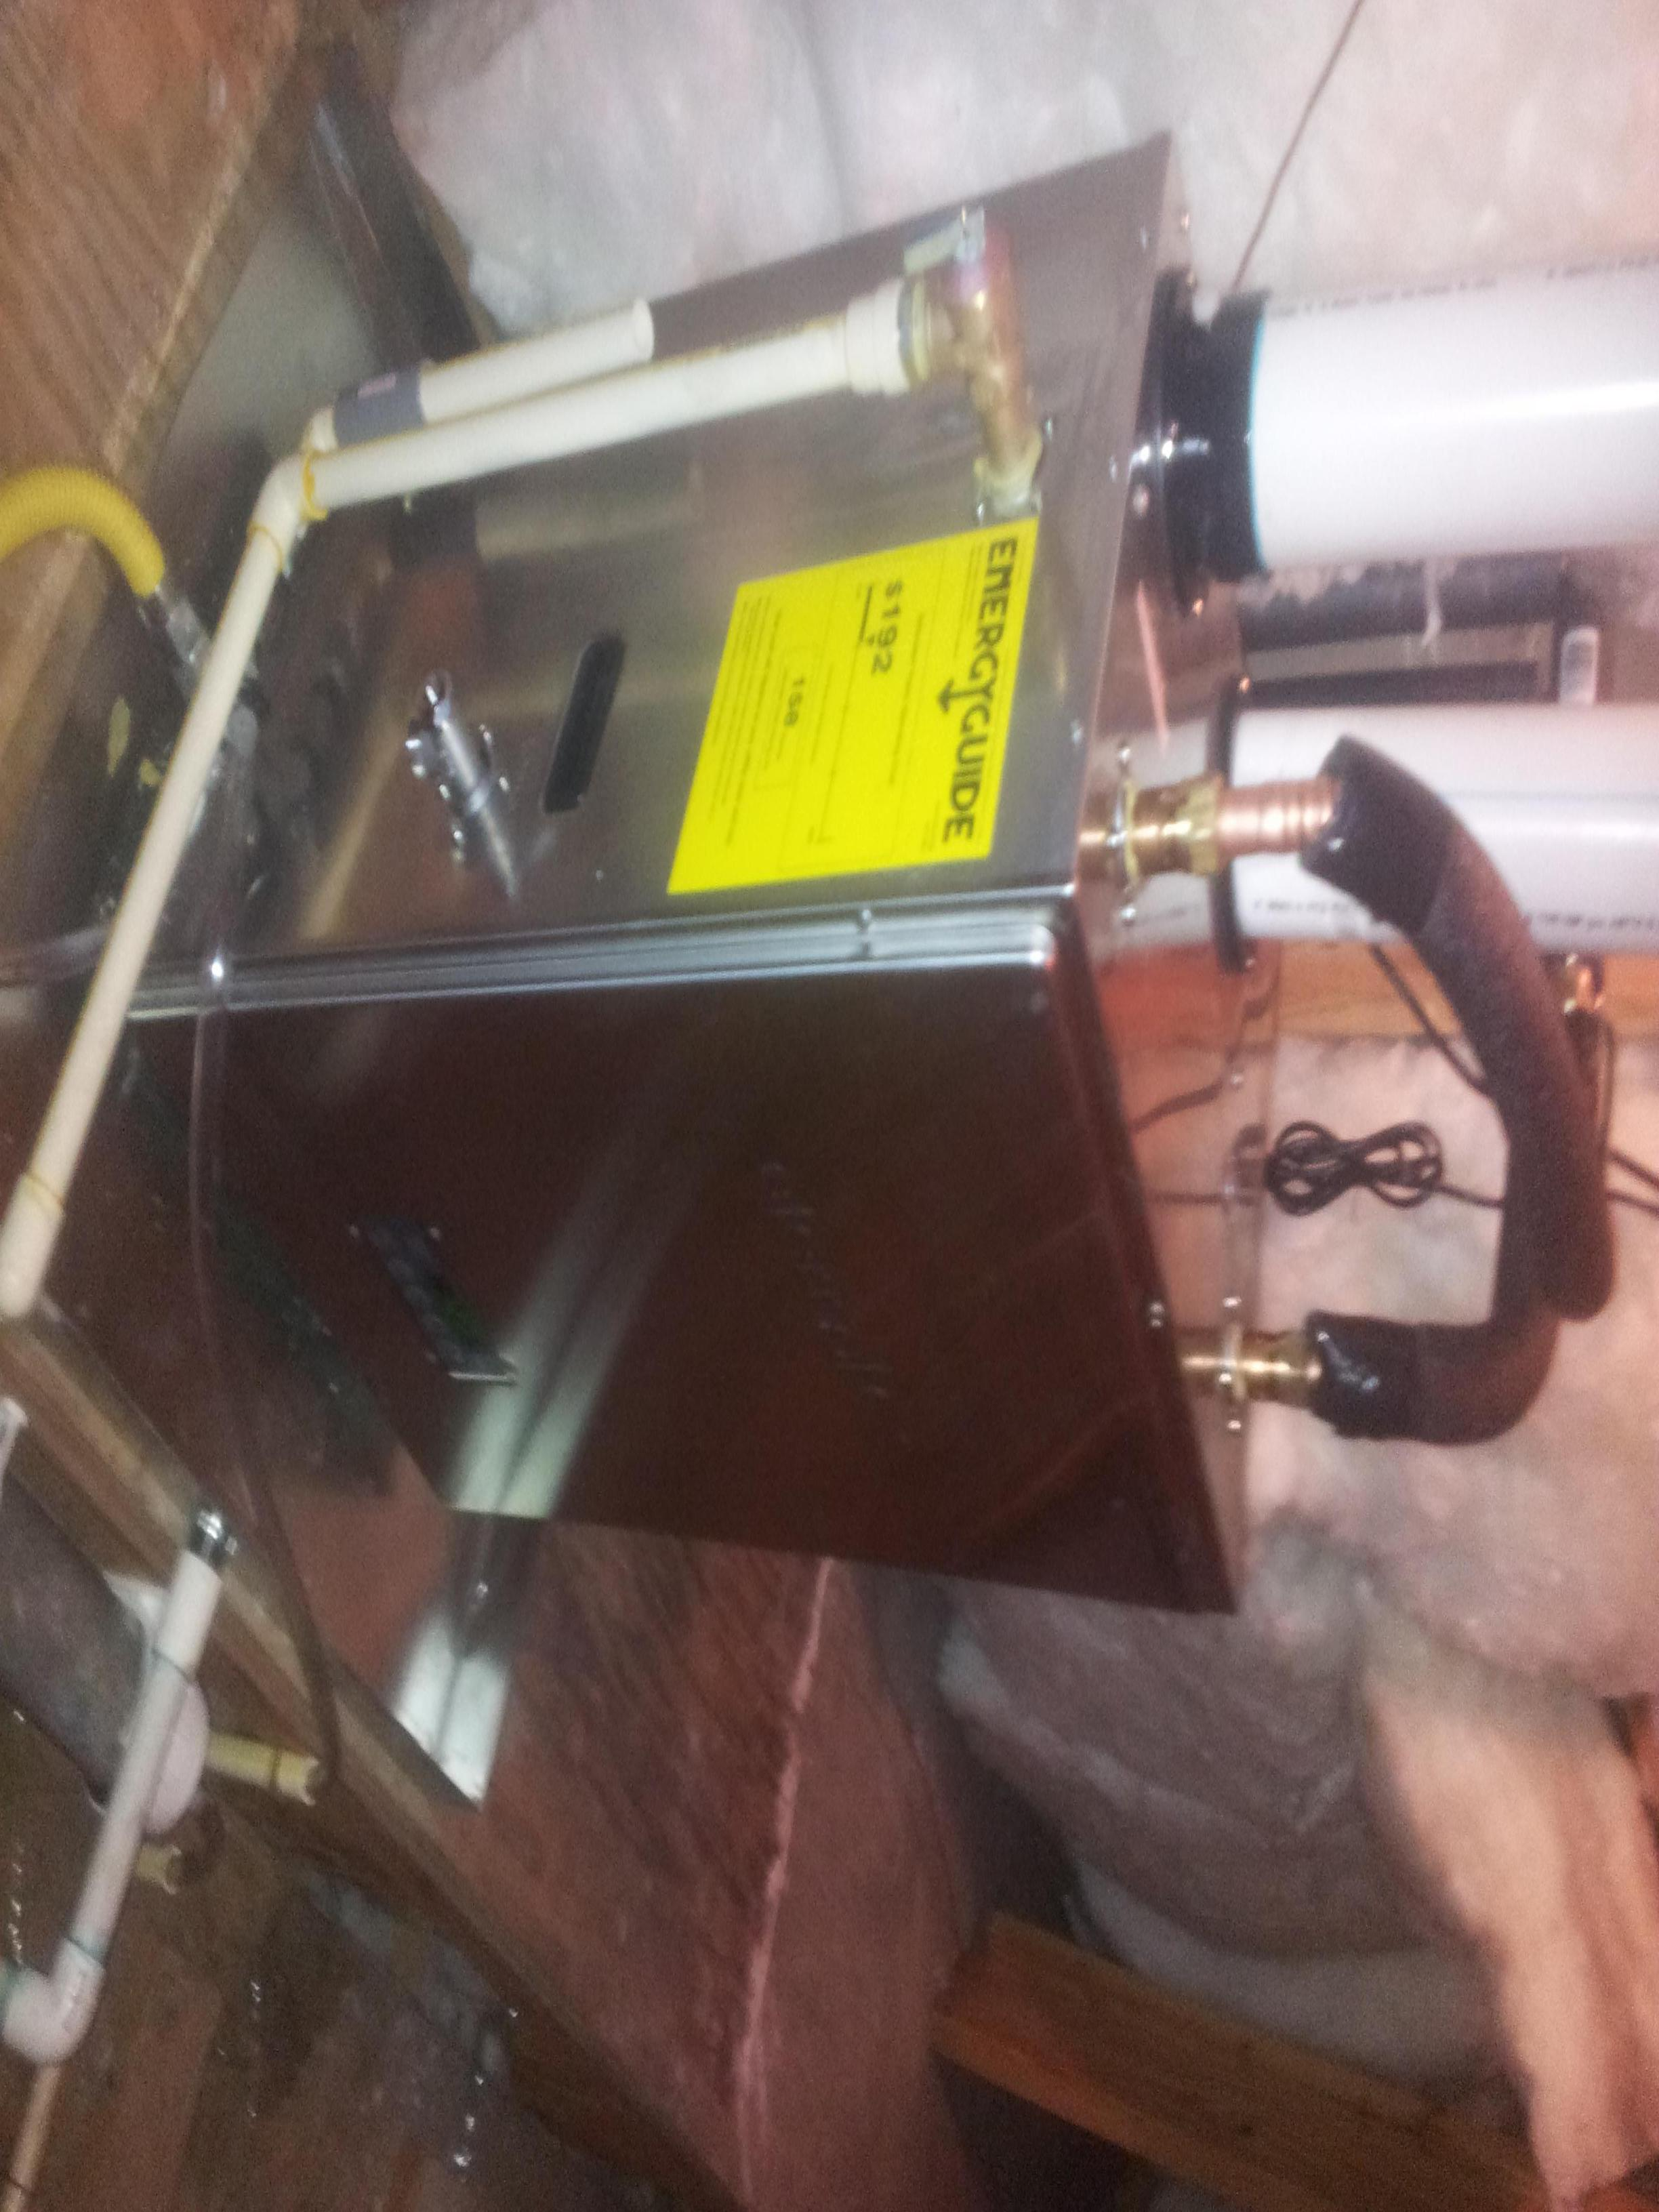 Heaton plumbing inc in la porte tx 281 941 2 for La porte tx water department